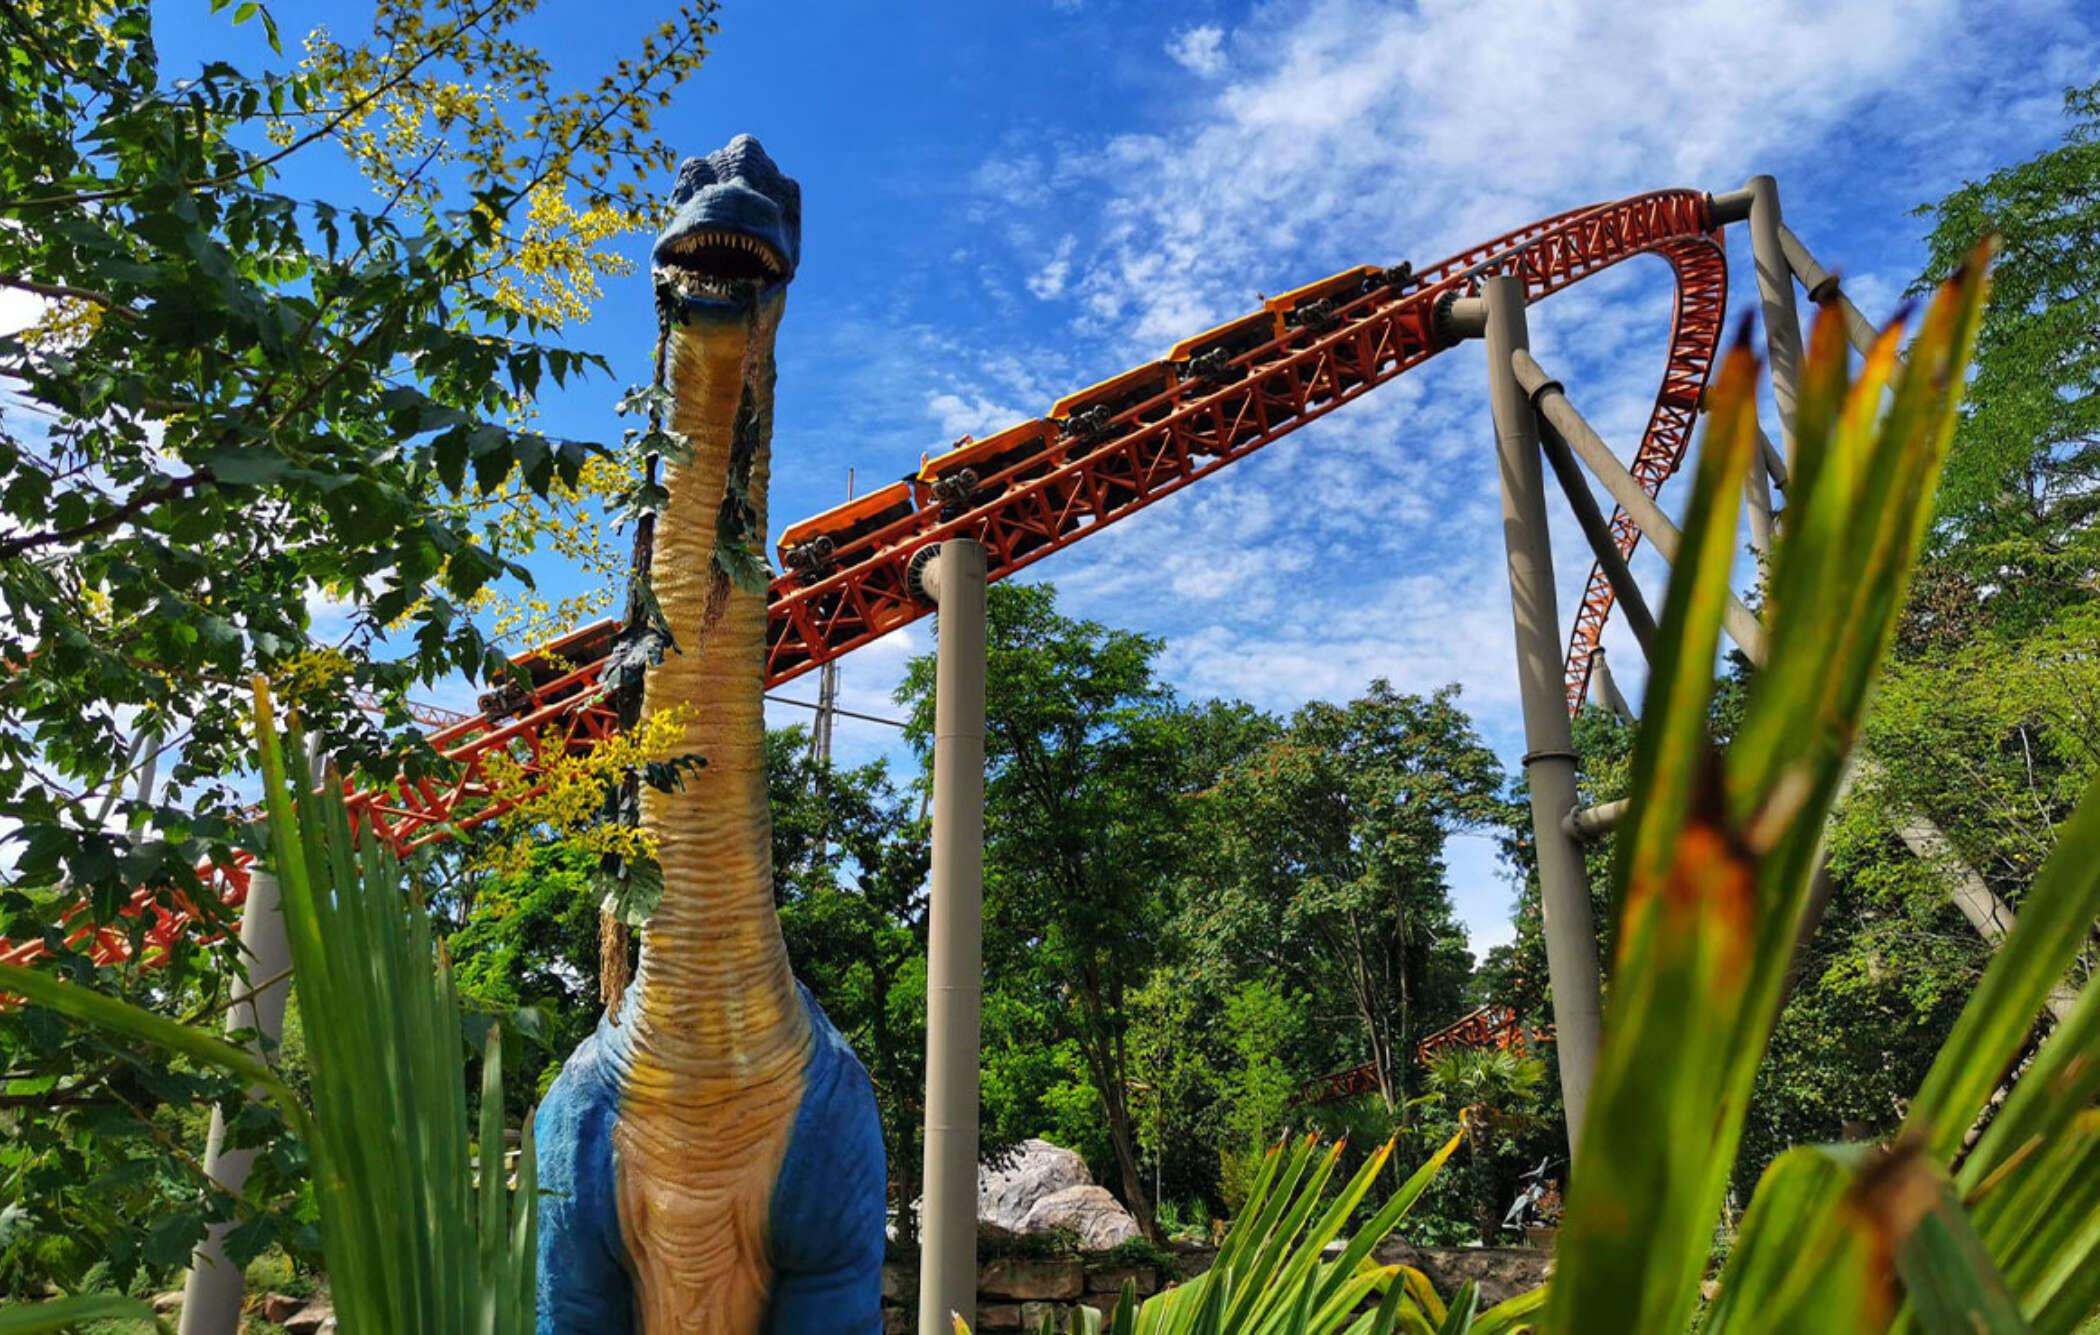 Dino splash 6